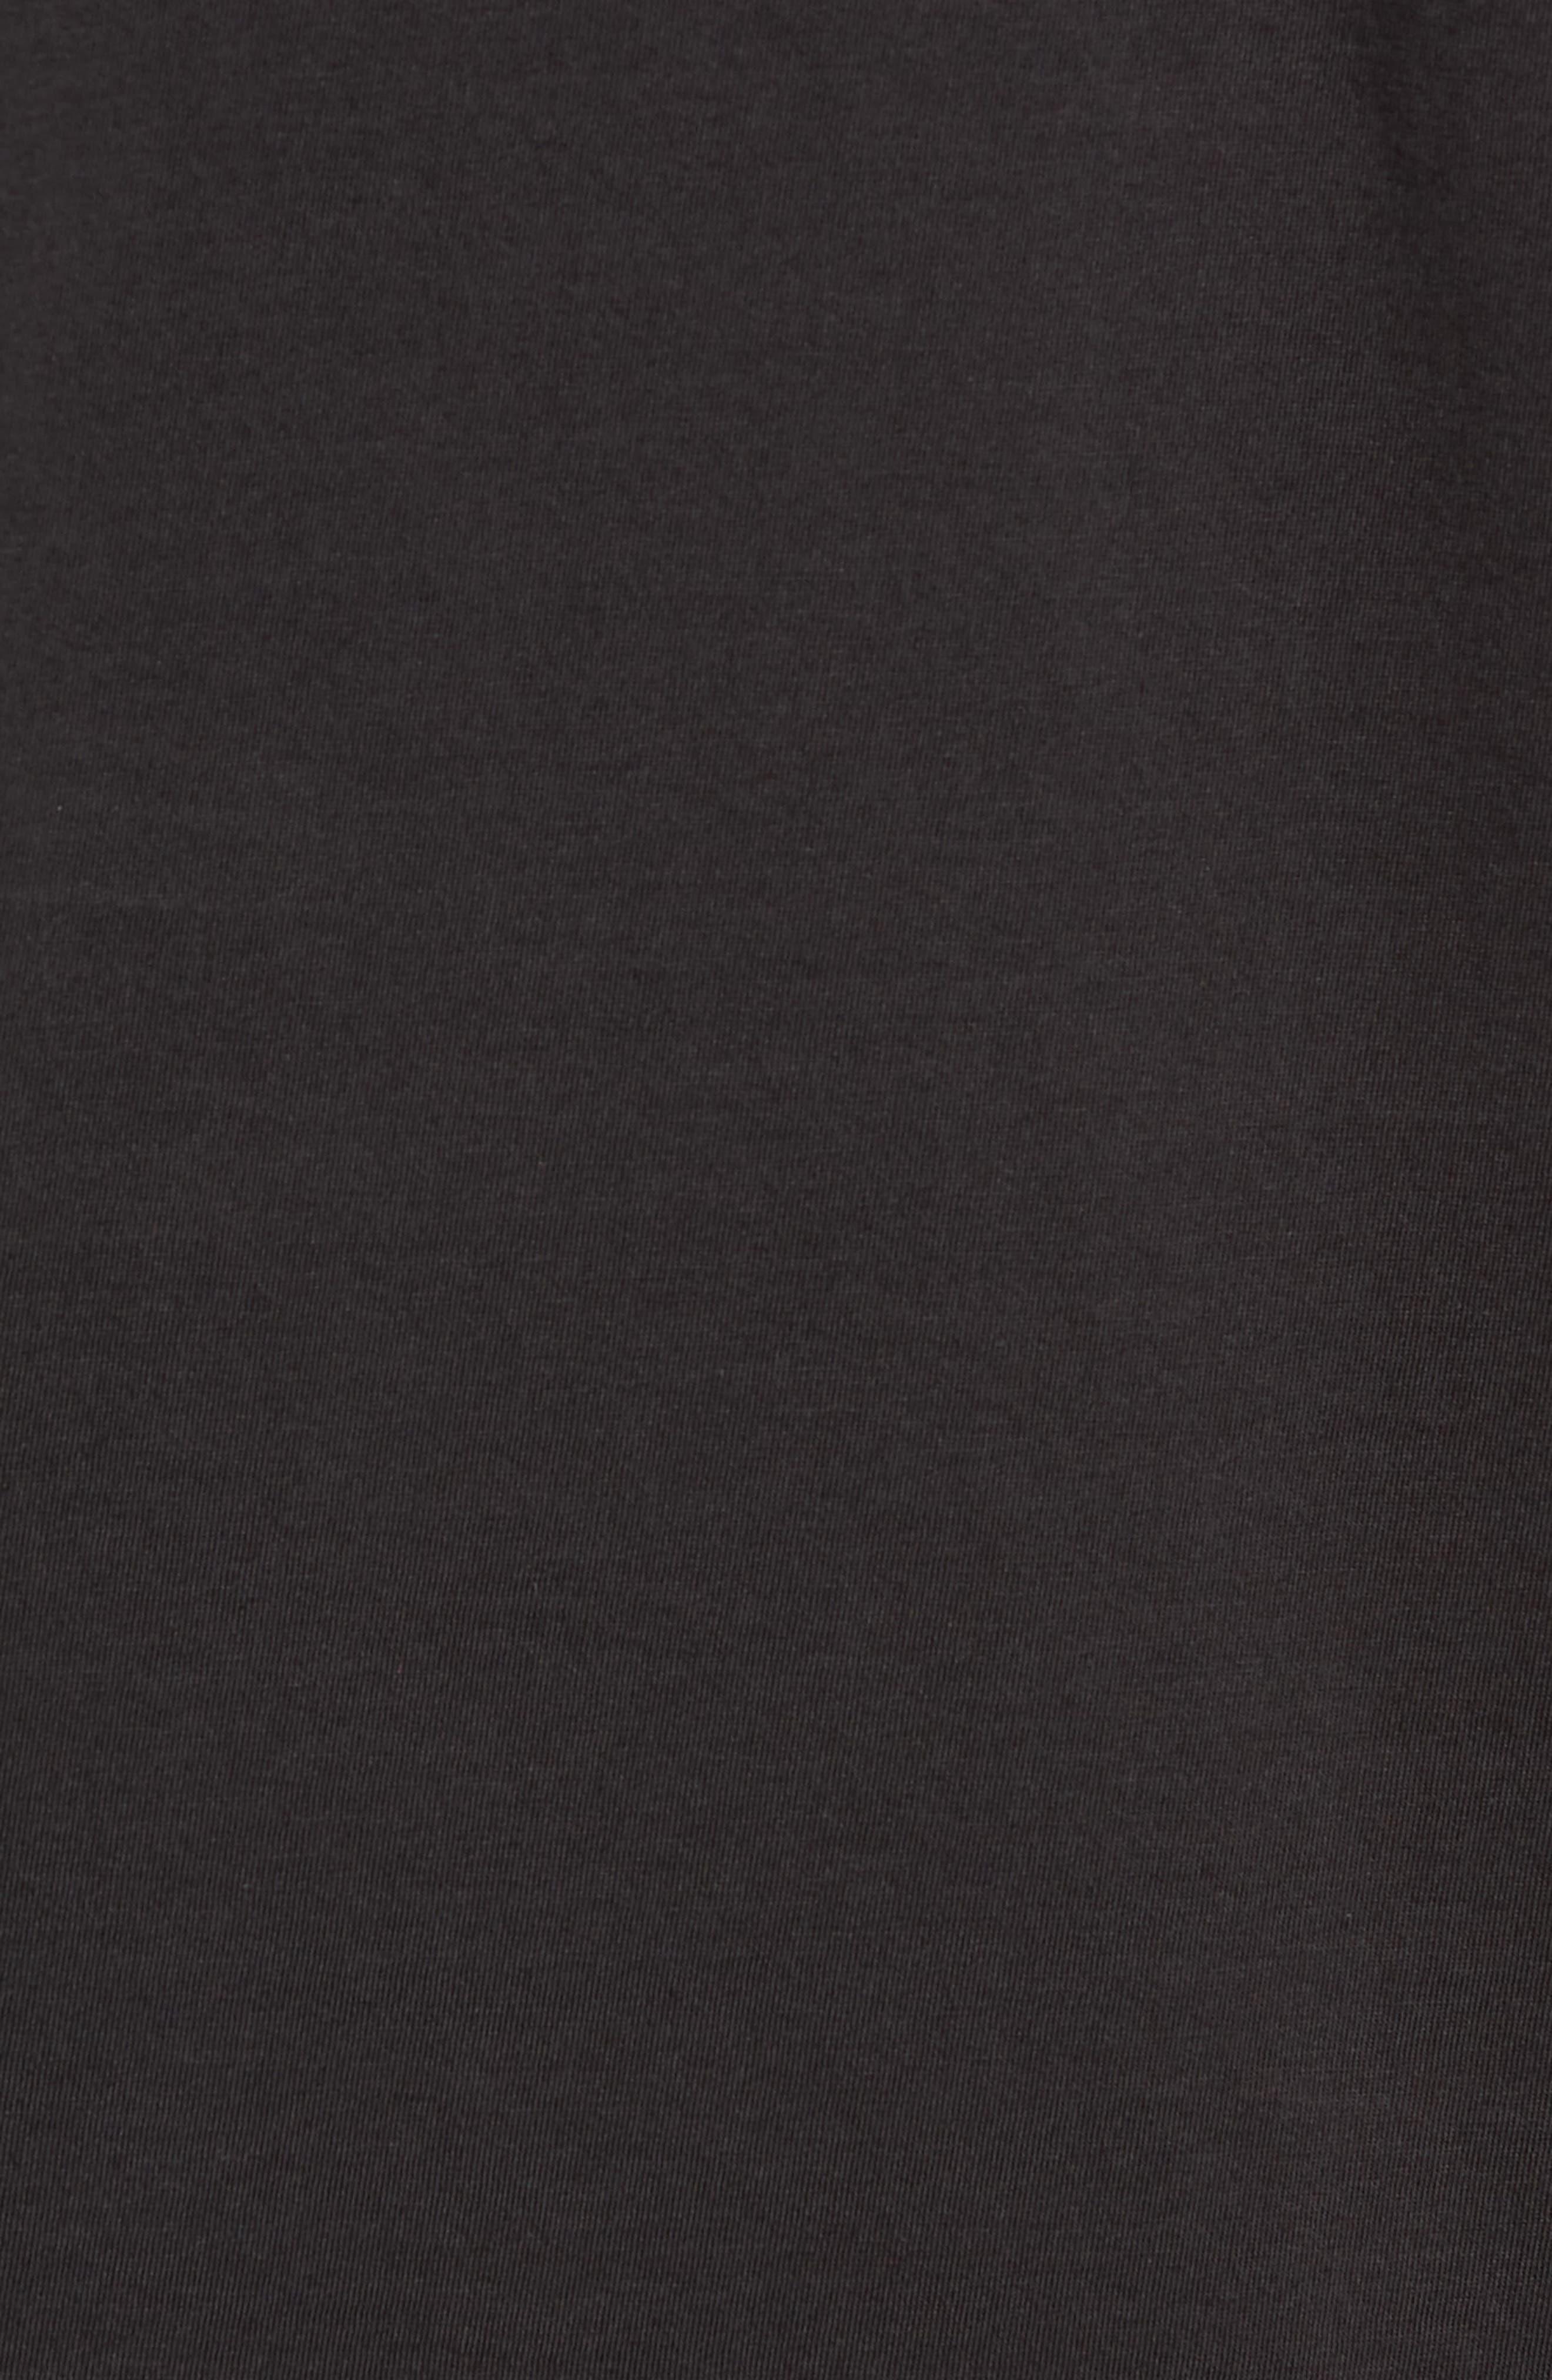 Superfine Slim Fit Long Sleeve Polo,                             Alternate thumbnail 5, color,                             CAVIAR BLACK